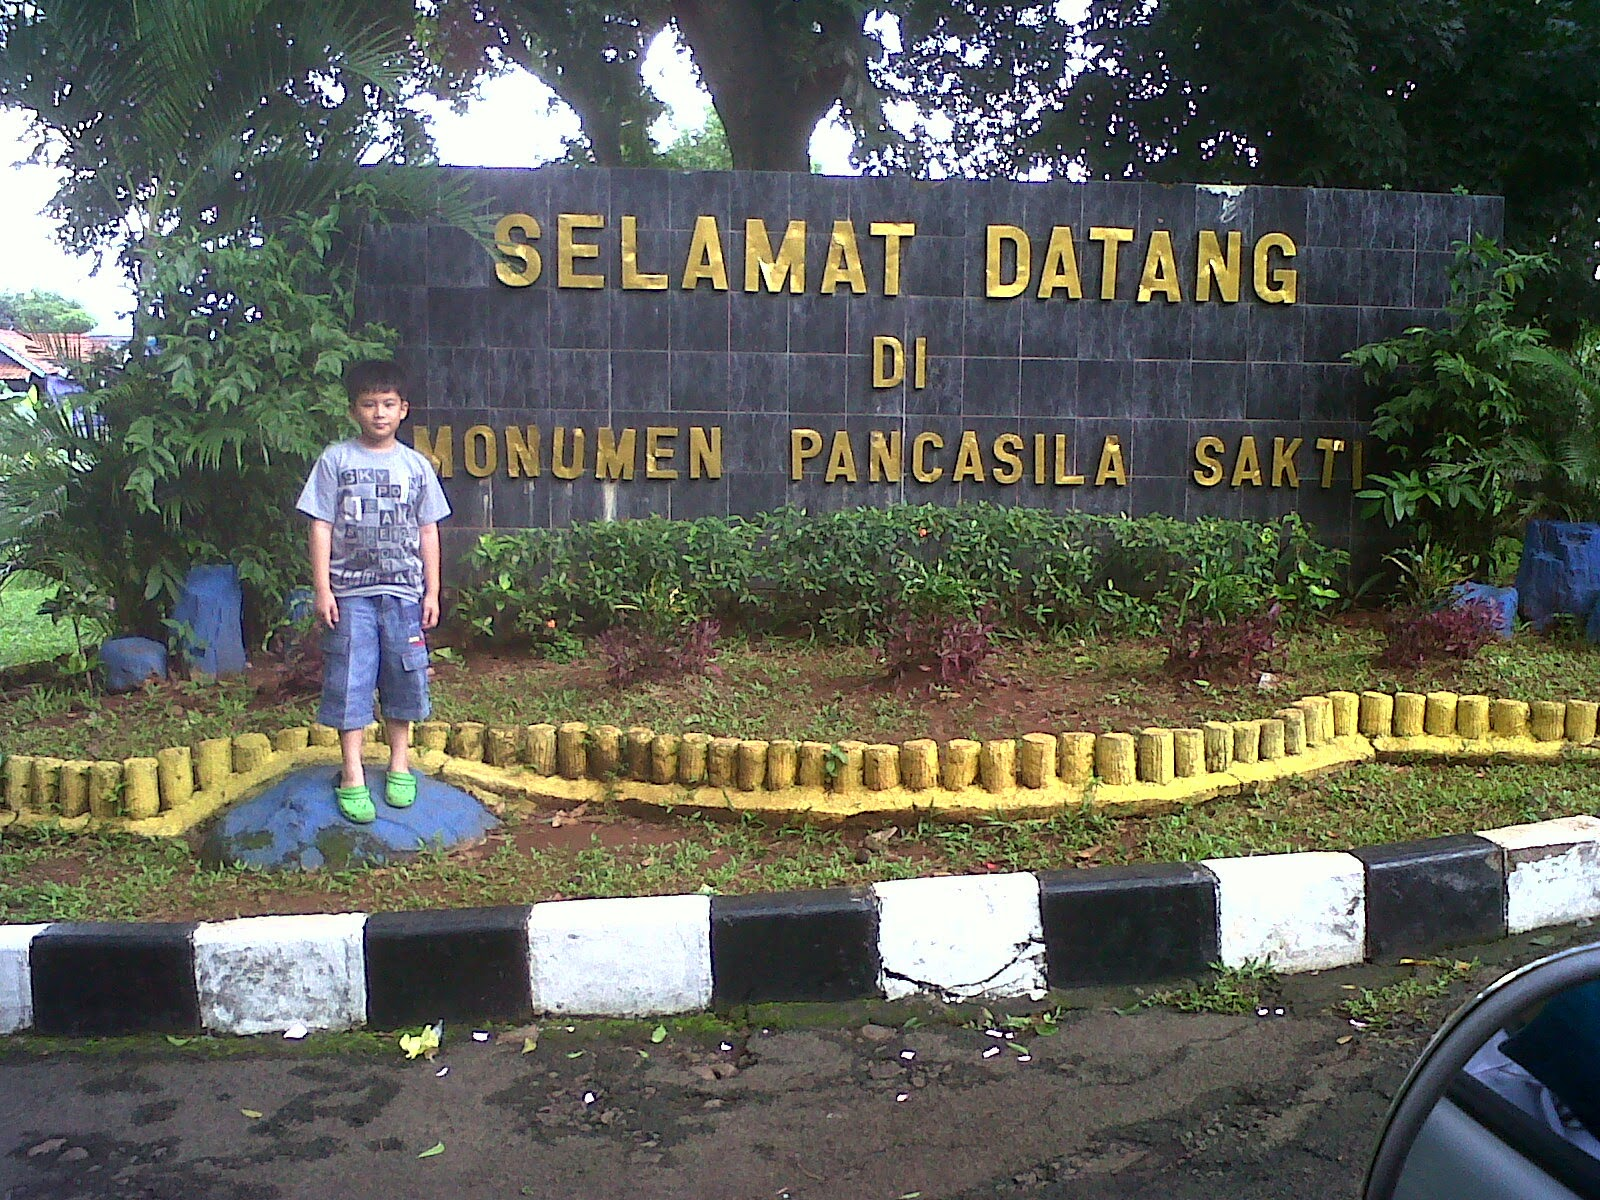 Life Is Beautiful Wisata Sejarah Jakarta Ke Monumen Pancasila Sakti